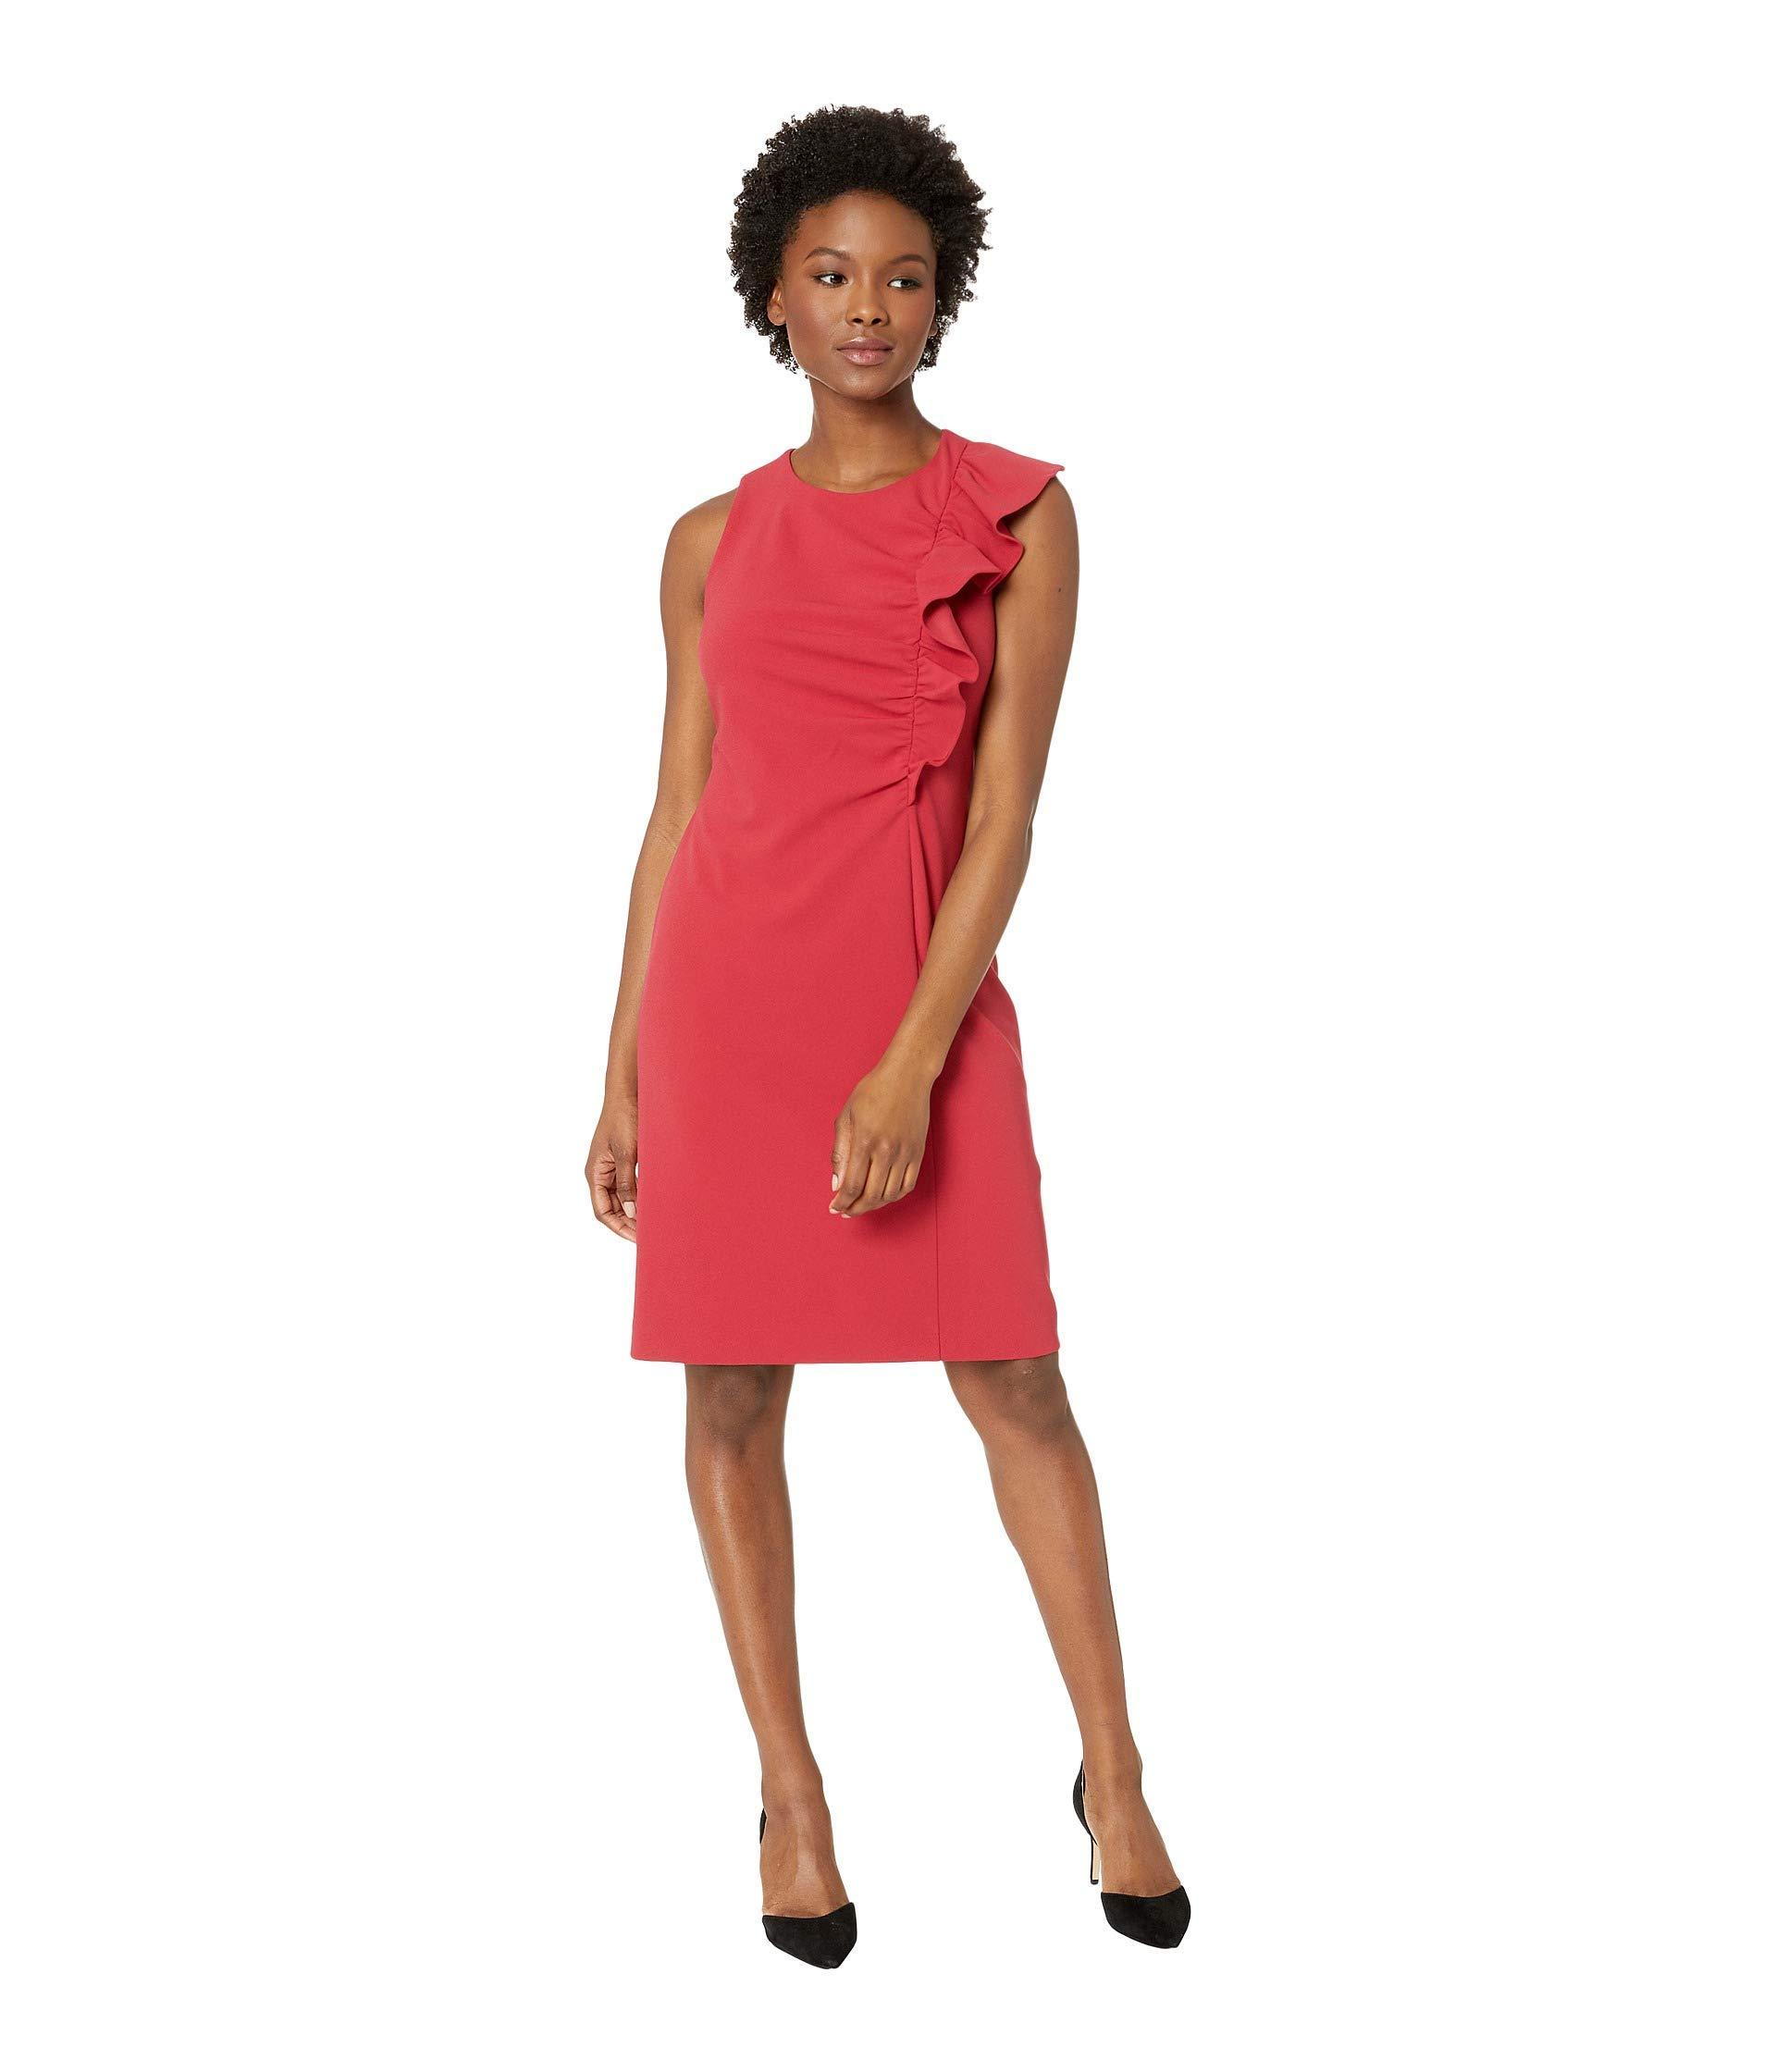 Available at Amazon: Vince Camuto Women's Sleeveless Asymmetrical Ruffle Ponte Dress